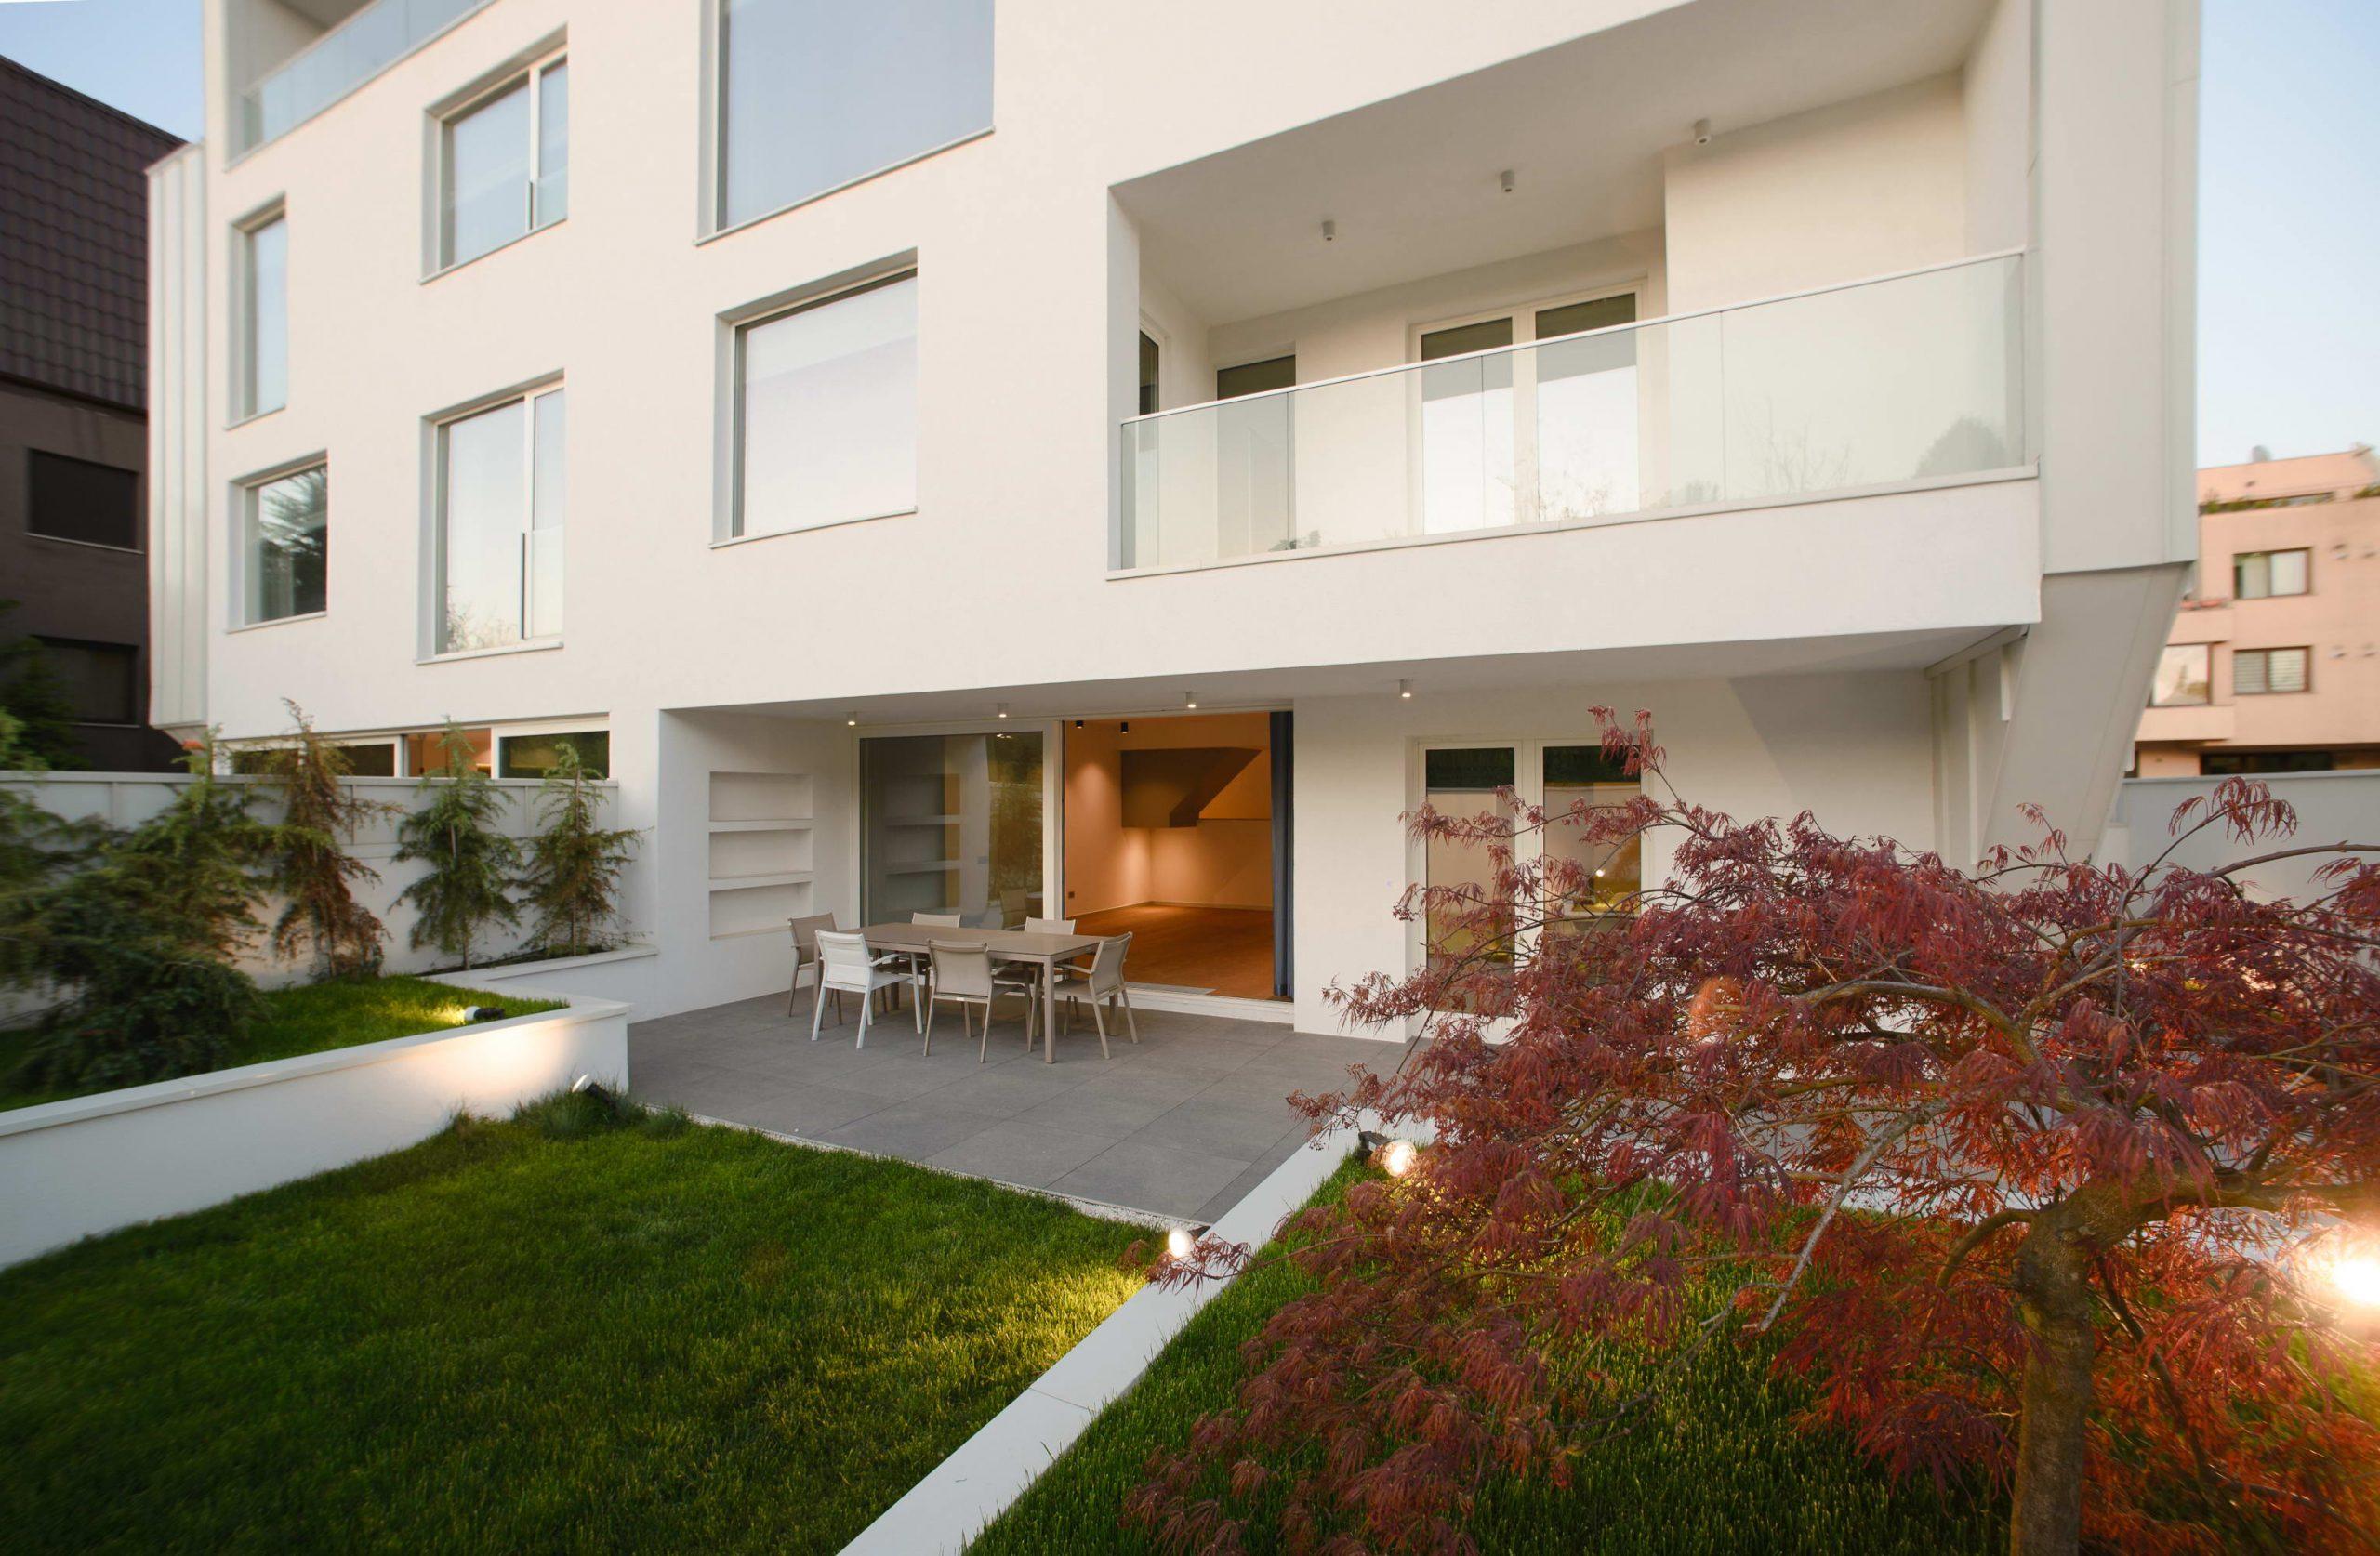 https://nbc-arhitect.ro/wp-content/uploads/2020/10/NBC-Arhitect-_-residential-_-Duplex-Forest-Residence-_-Romania_29-scaled.jpg